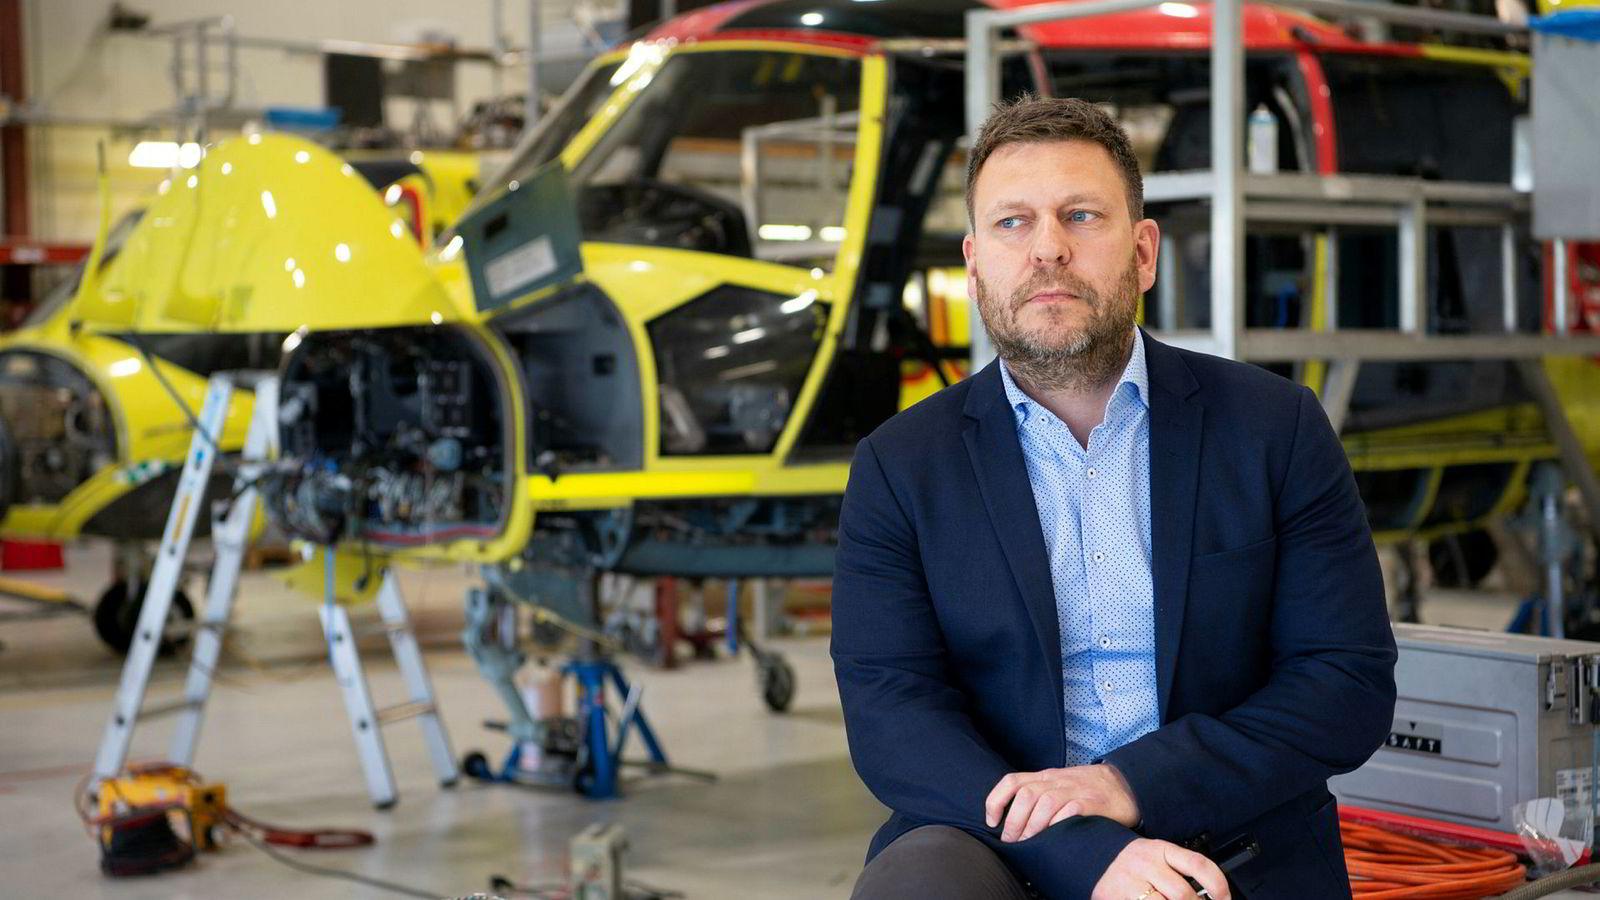 Administrerende direktør Frank Wilhelmsen i Lufttransport skal torsdag forklare seg under en høring i Stortinget.